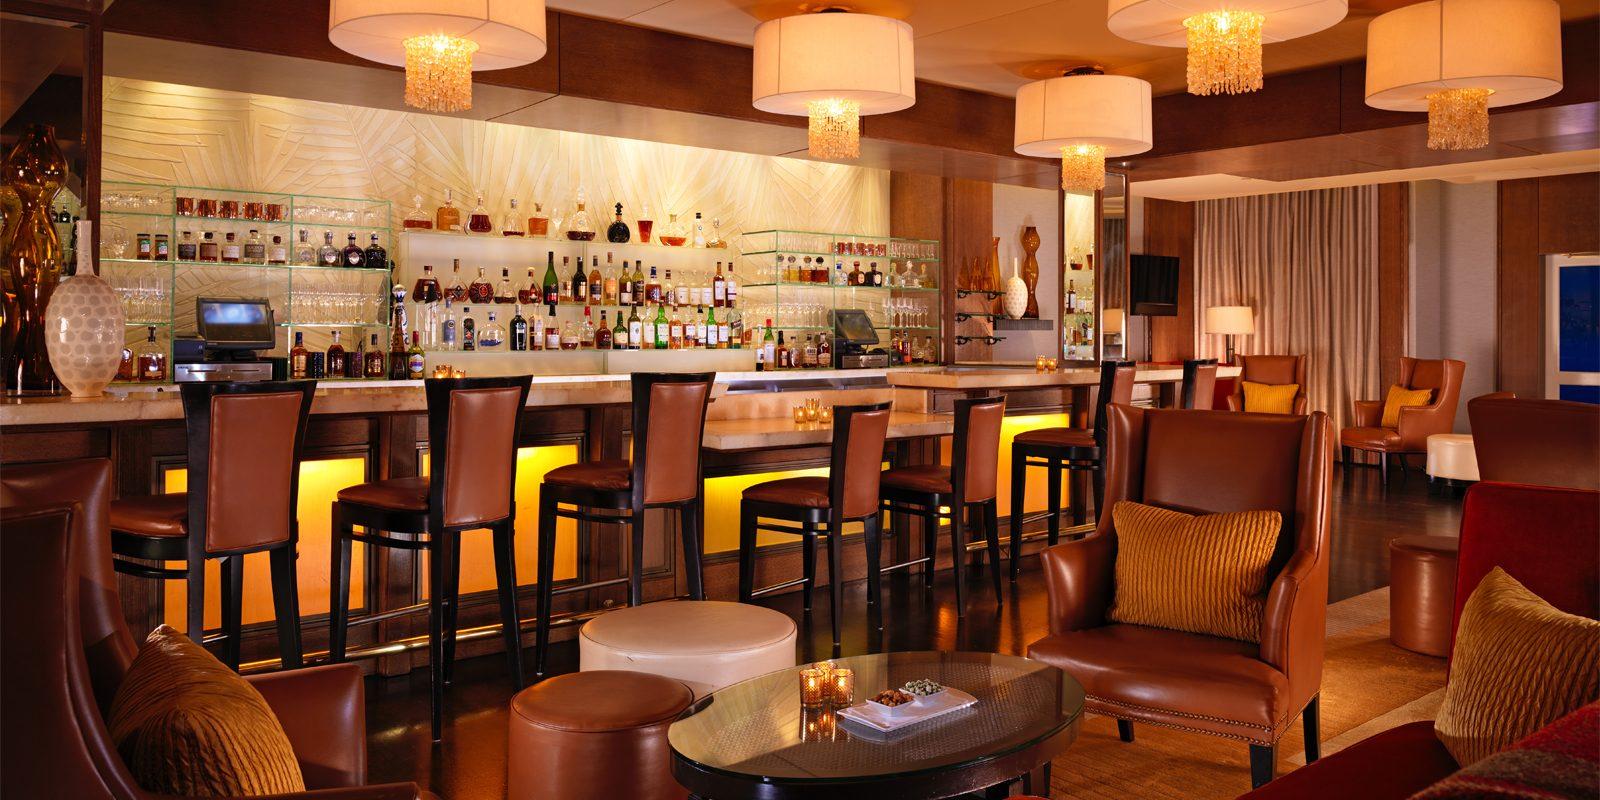 Entertain in Bar Nineteen12